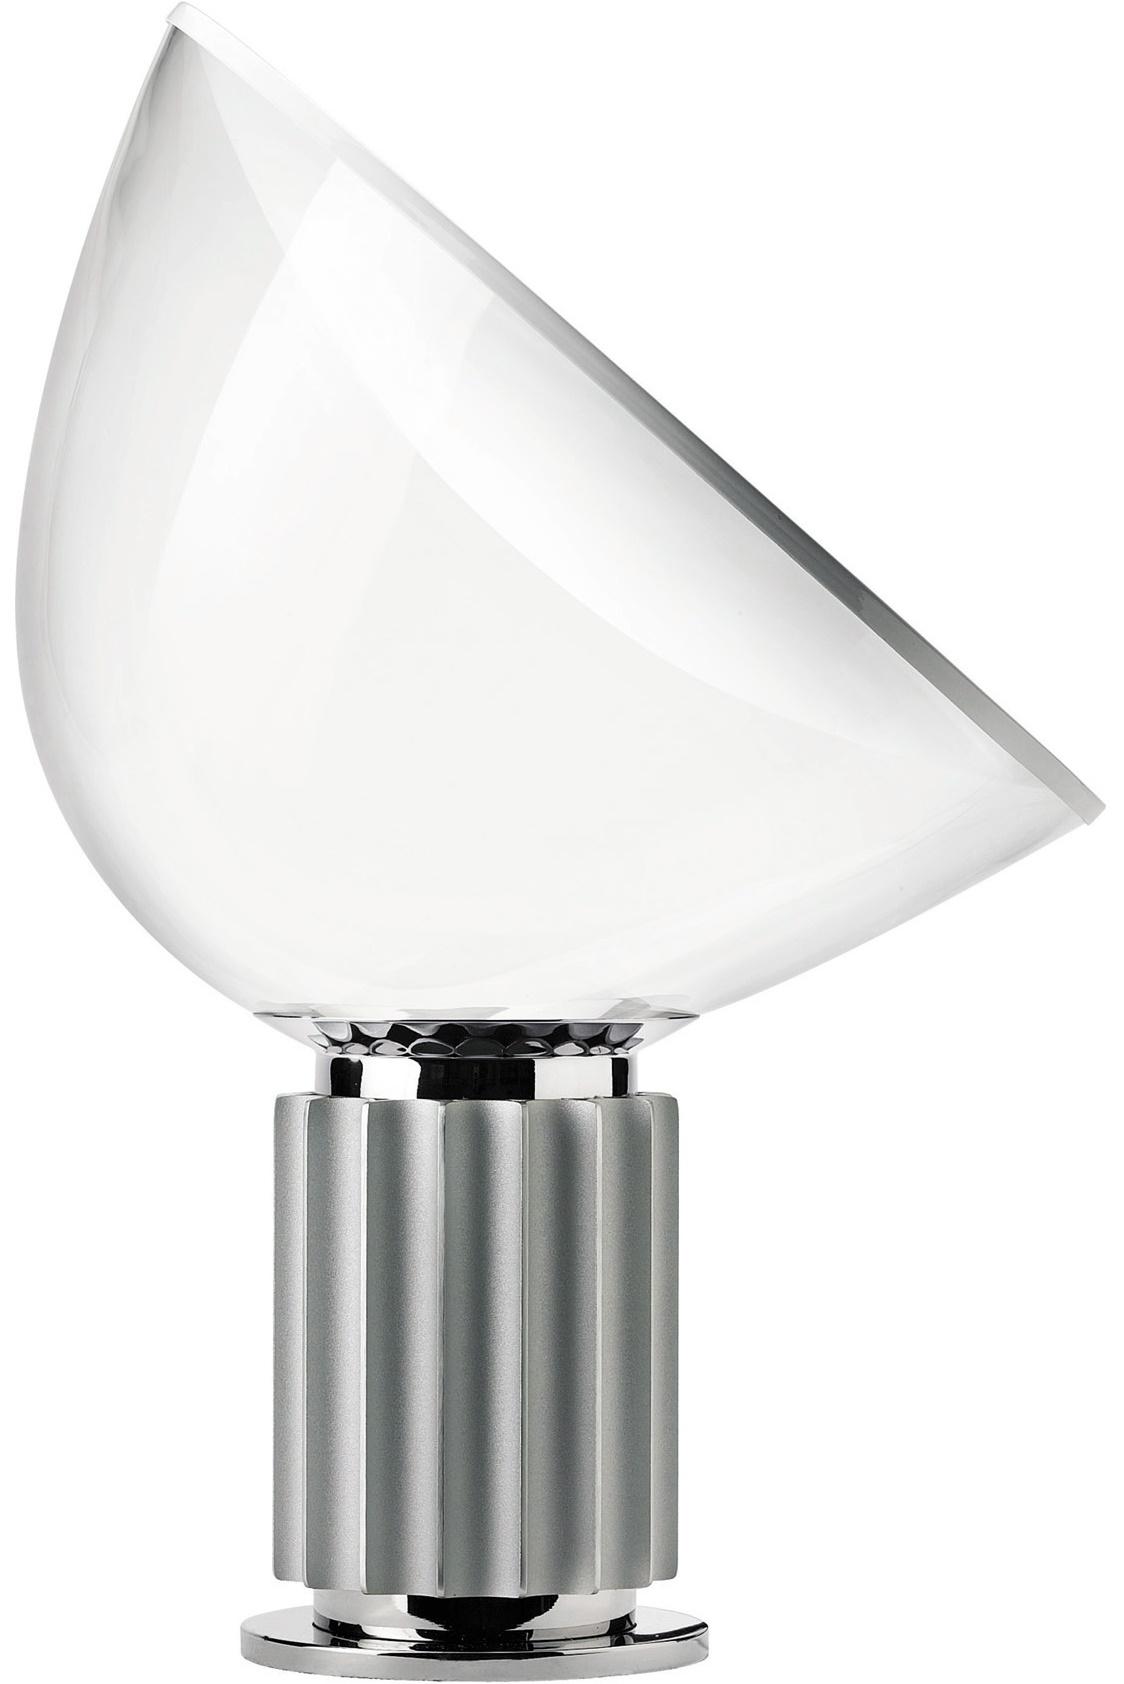 Flos for sale online – Flos Desk Lamp